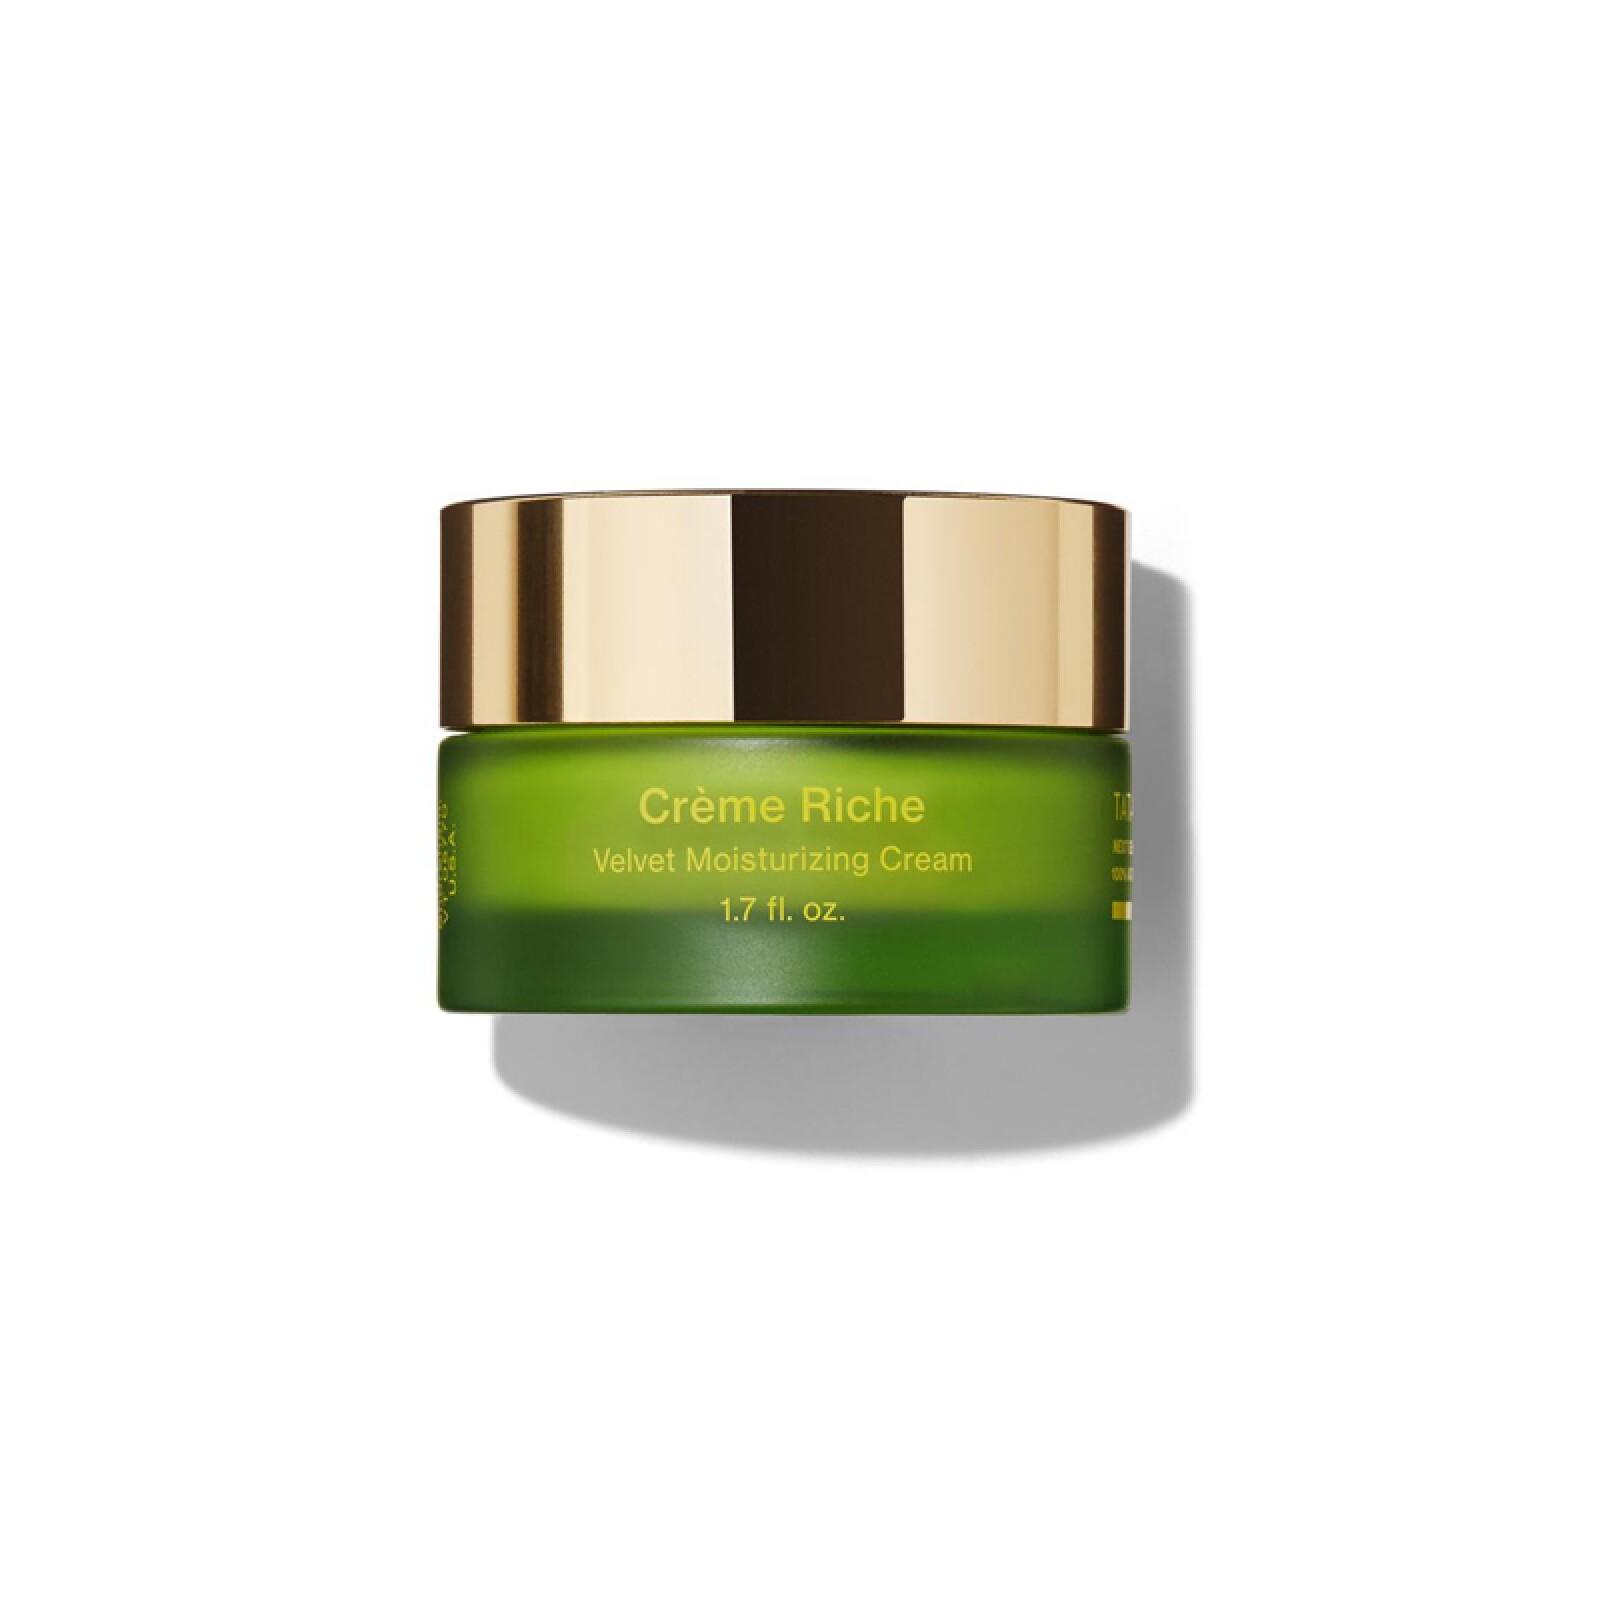 productos-maquillaje-skincare-belleza-beauty-rutina-tata